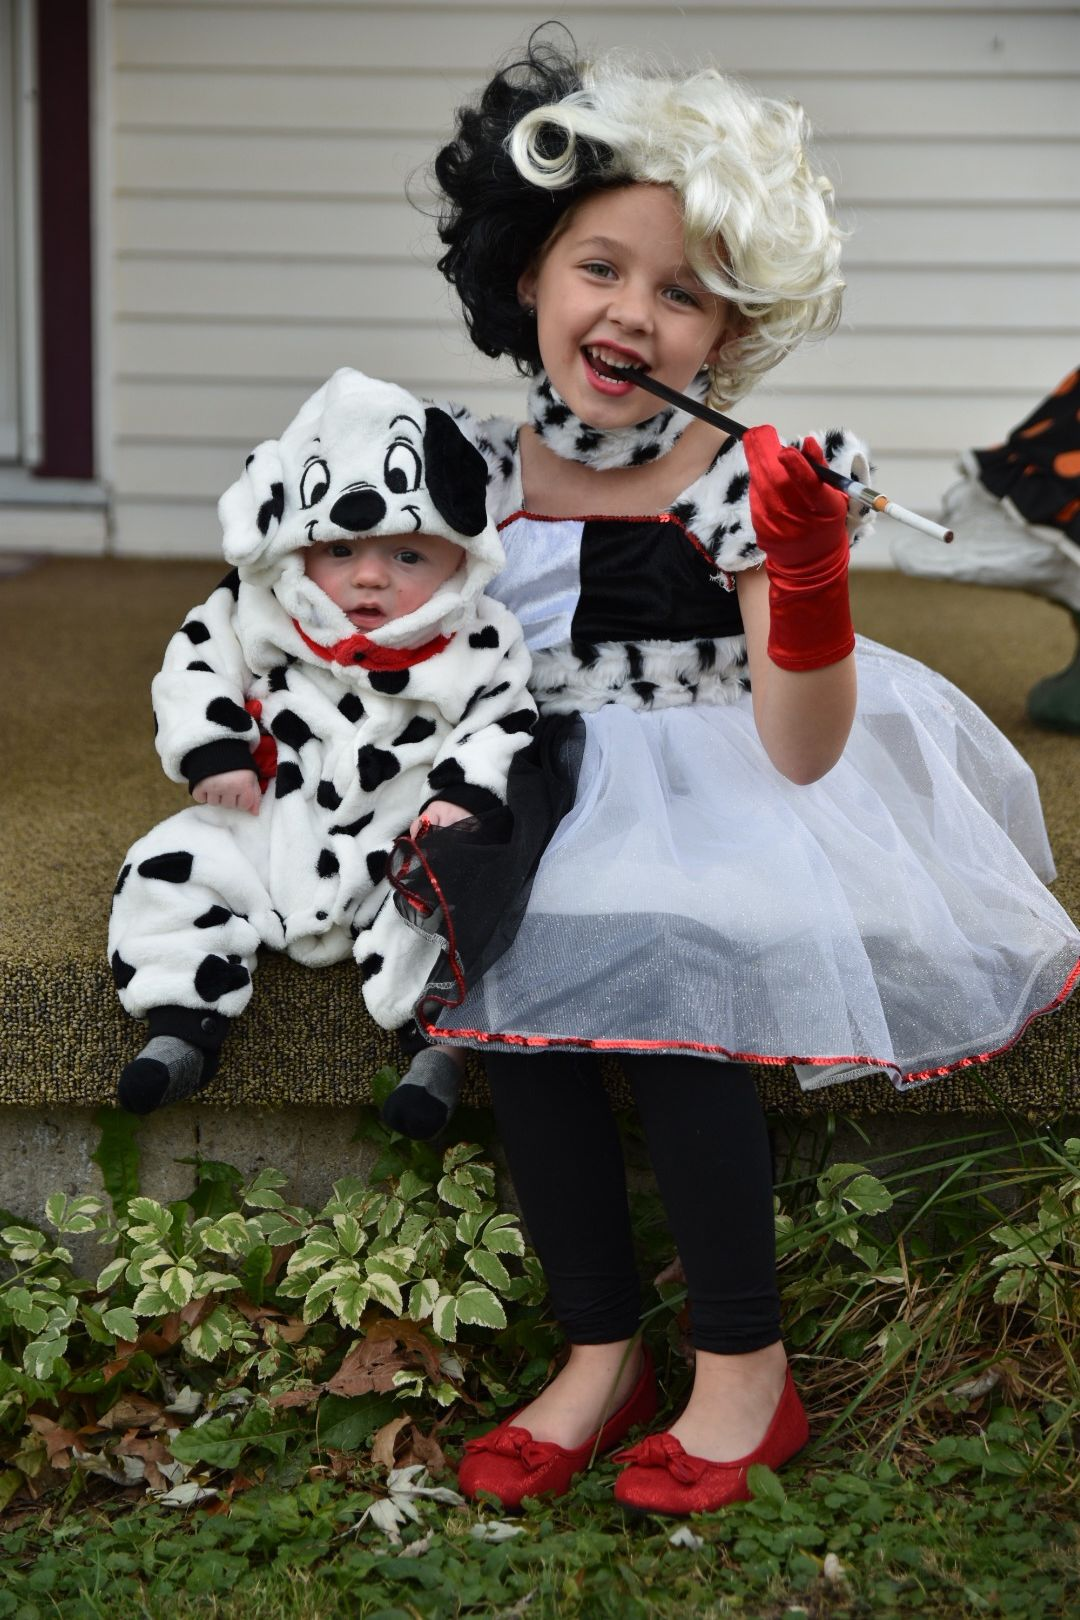 Sister Costume Halloween Fancy Dress Kleding en accessoires